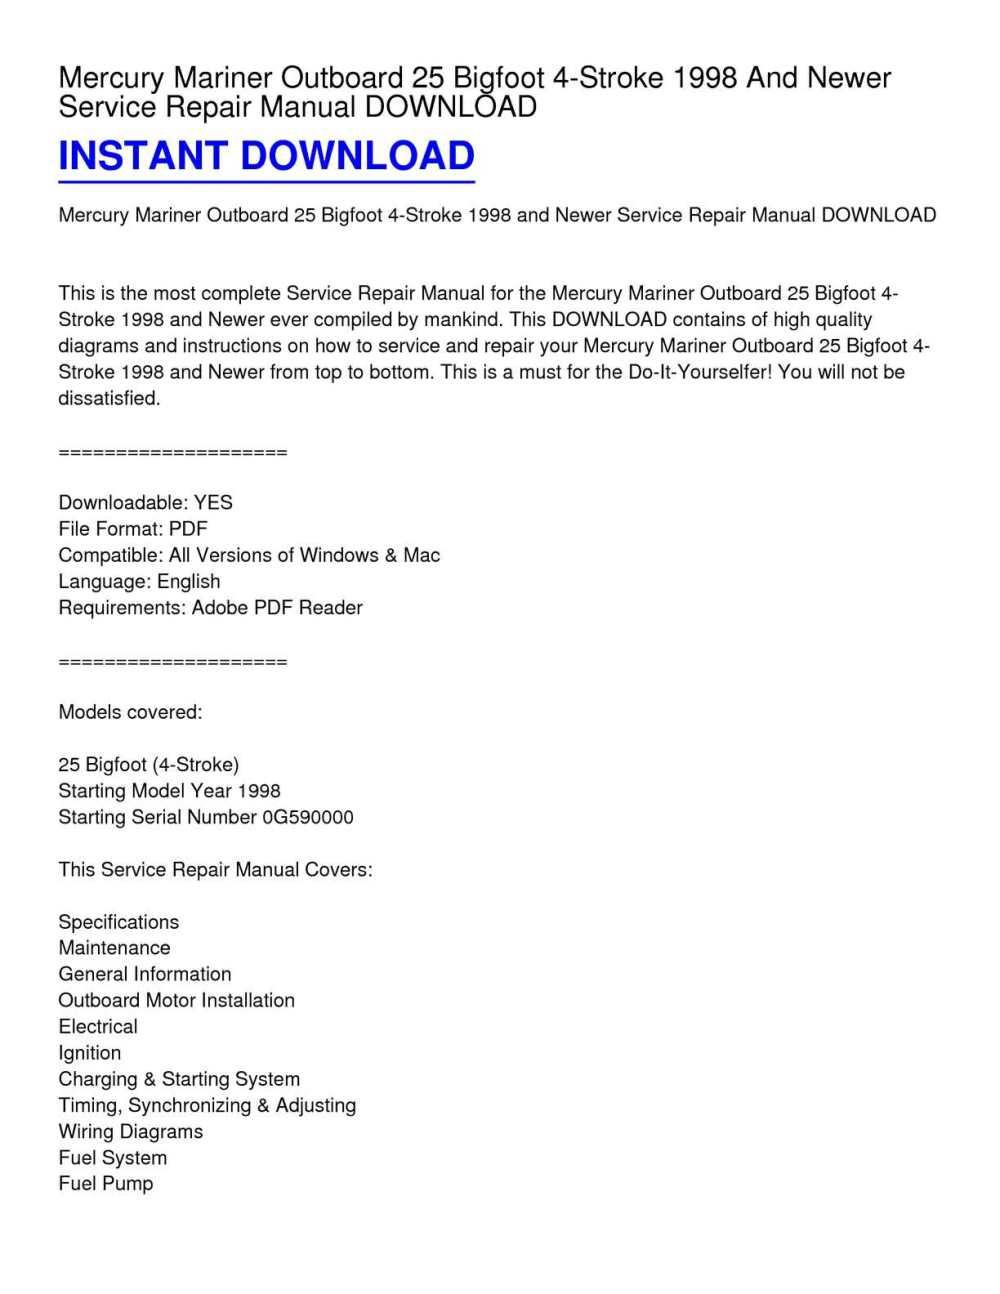 medium resolution of calam o mercury mariner outboard 25 bigfoot 4 stroke 1998 and newer service repair manual download